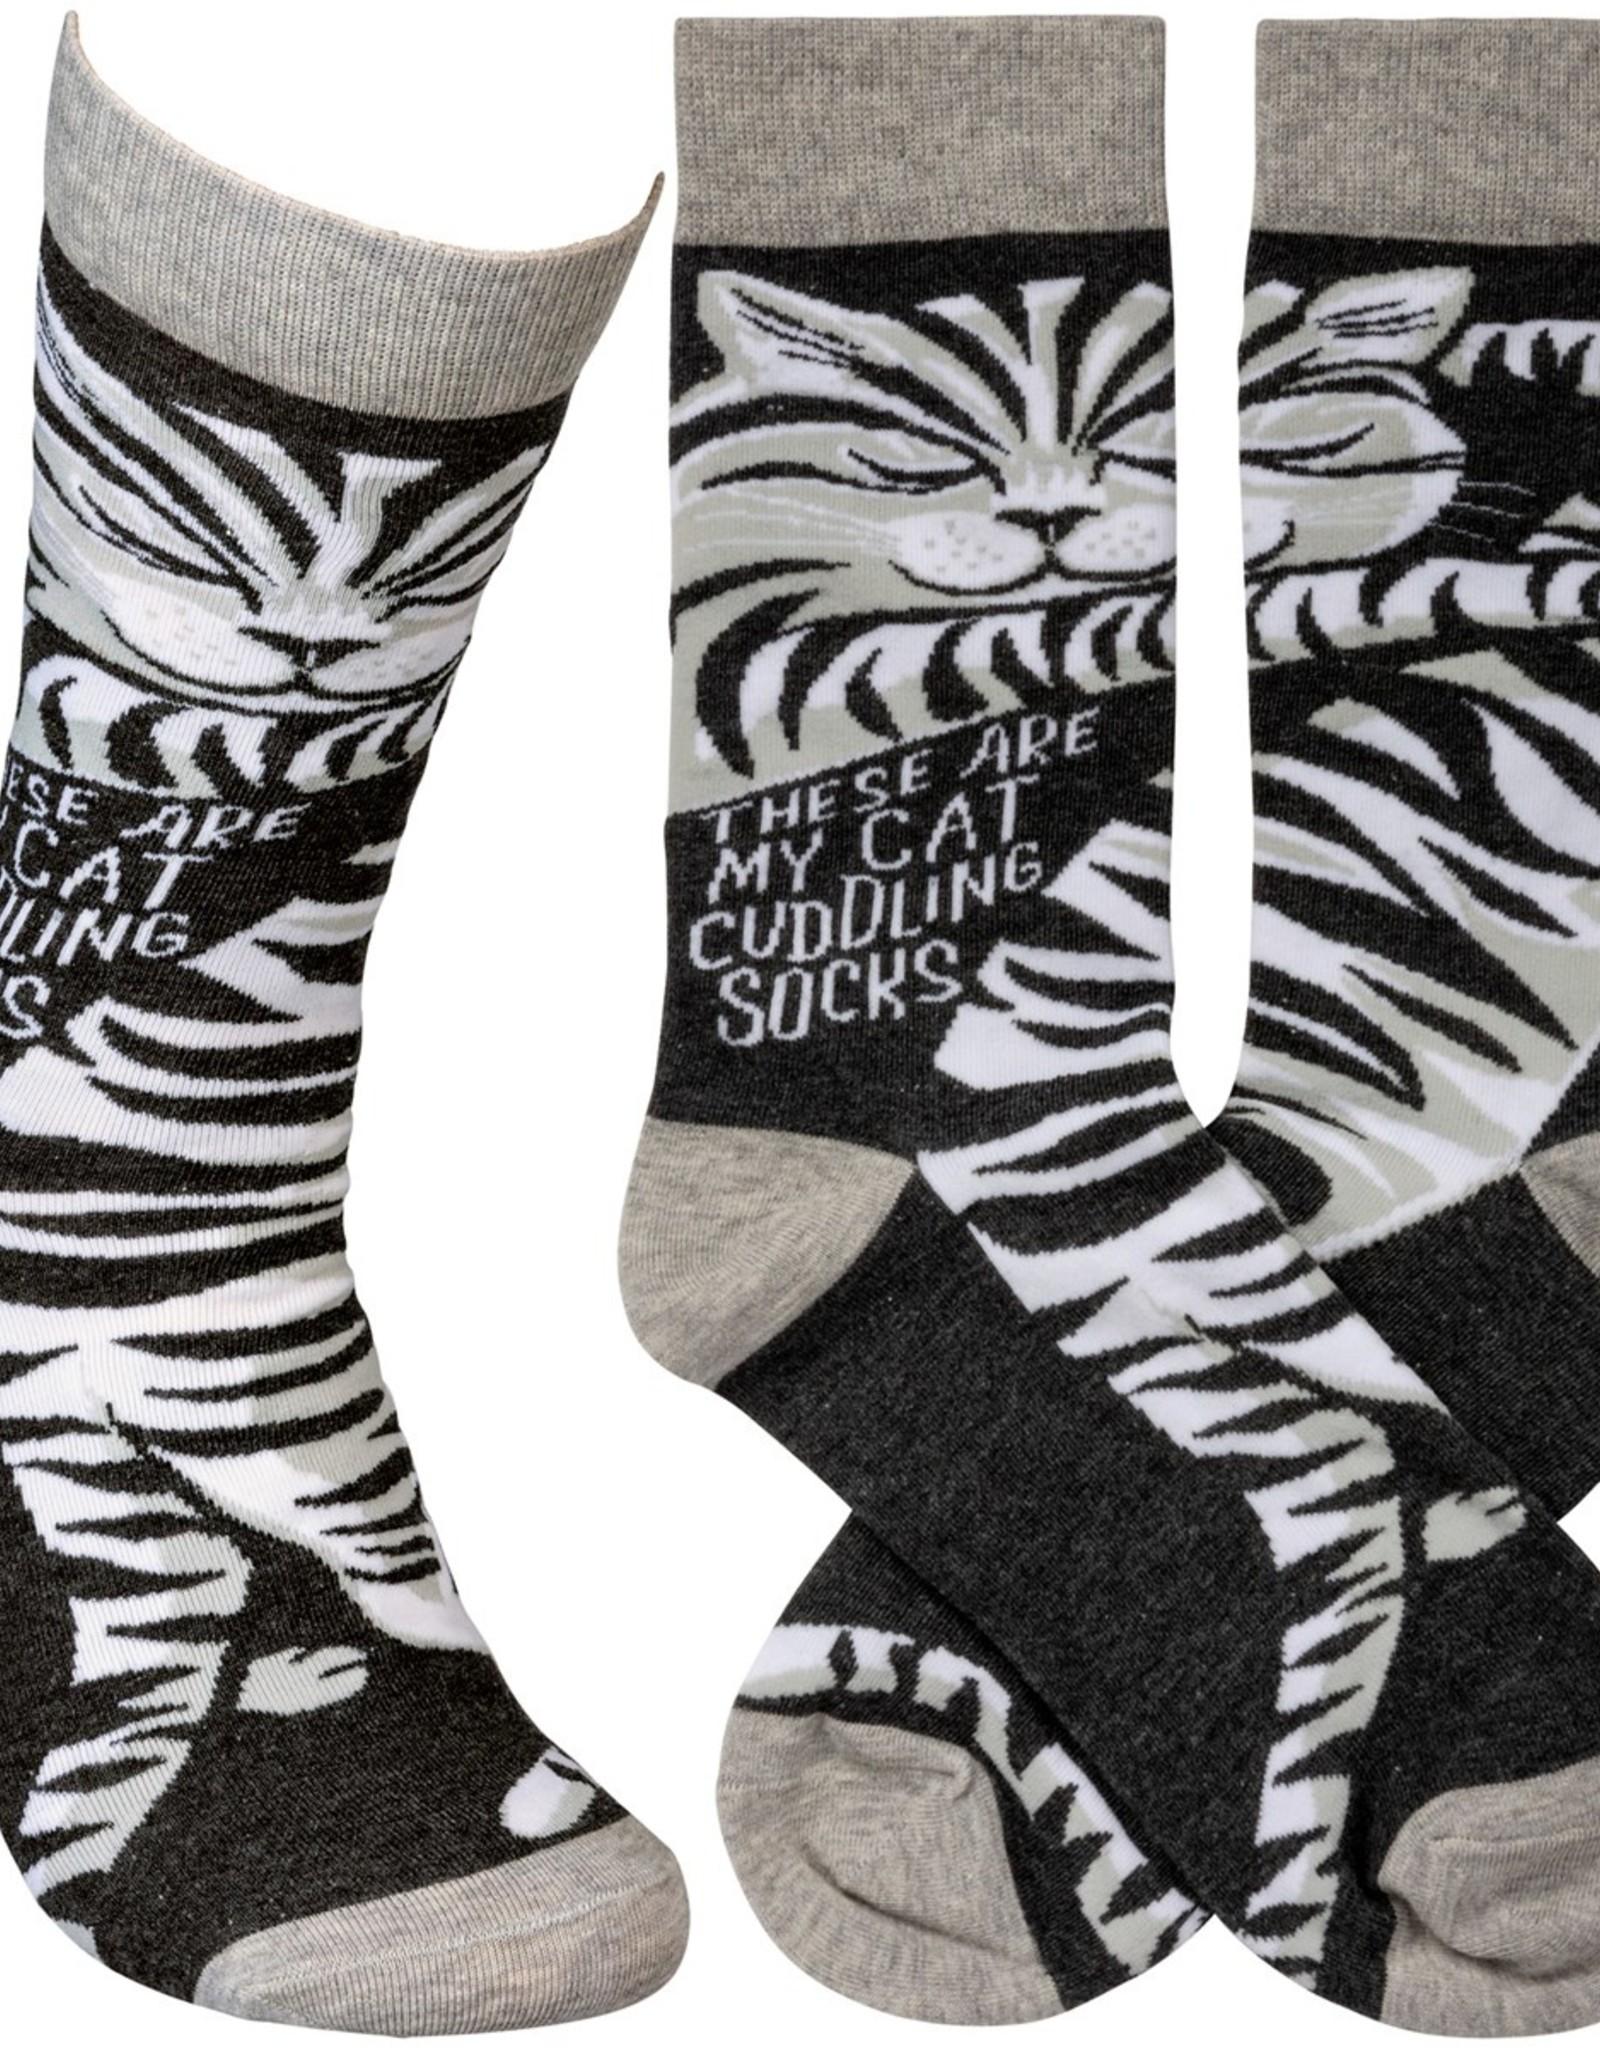 Primitives By Kathy Socks - Cat Cuddling Socks